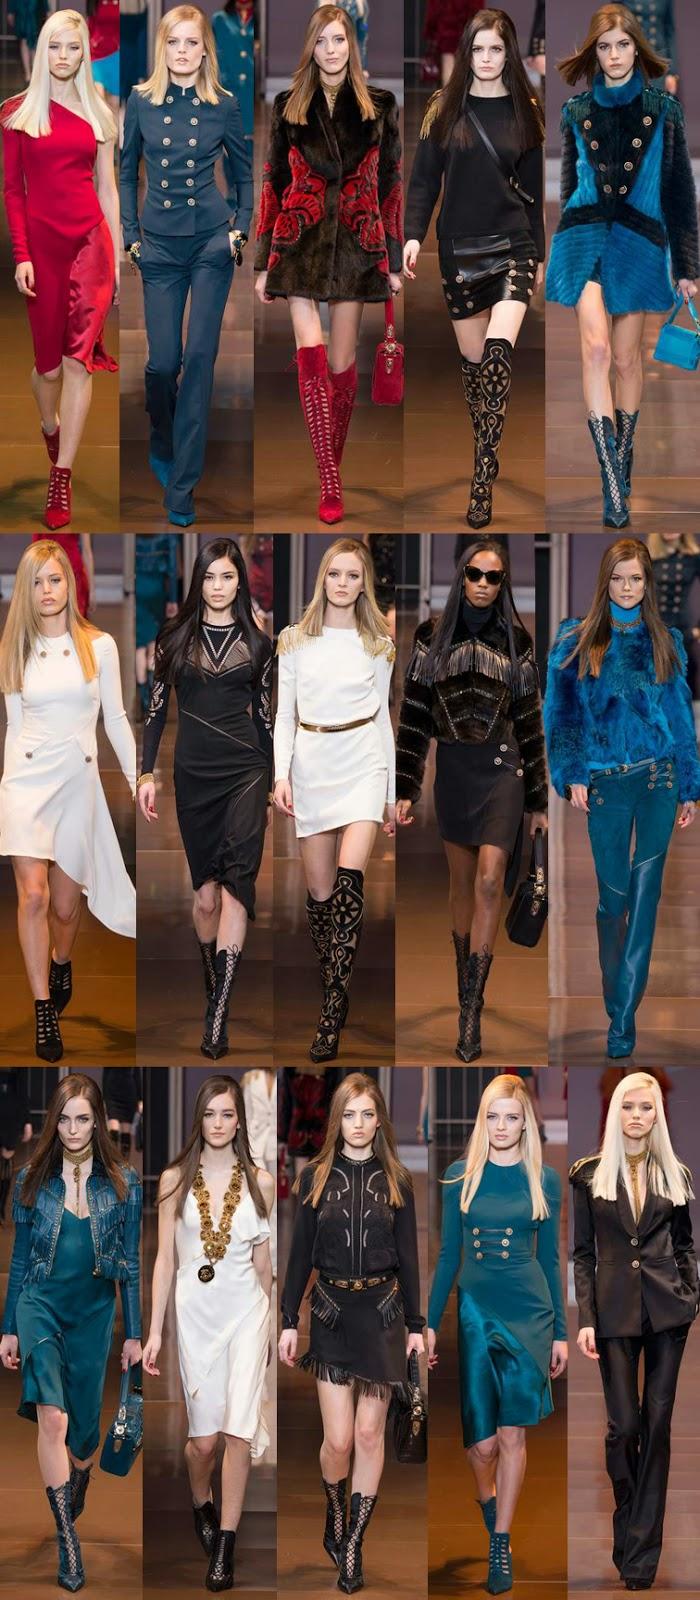 Versace fall winter 2014 runway collection, FW14, AW14, MFW, Milan fashion week, Donatella Versace